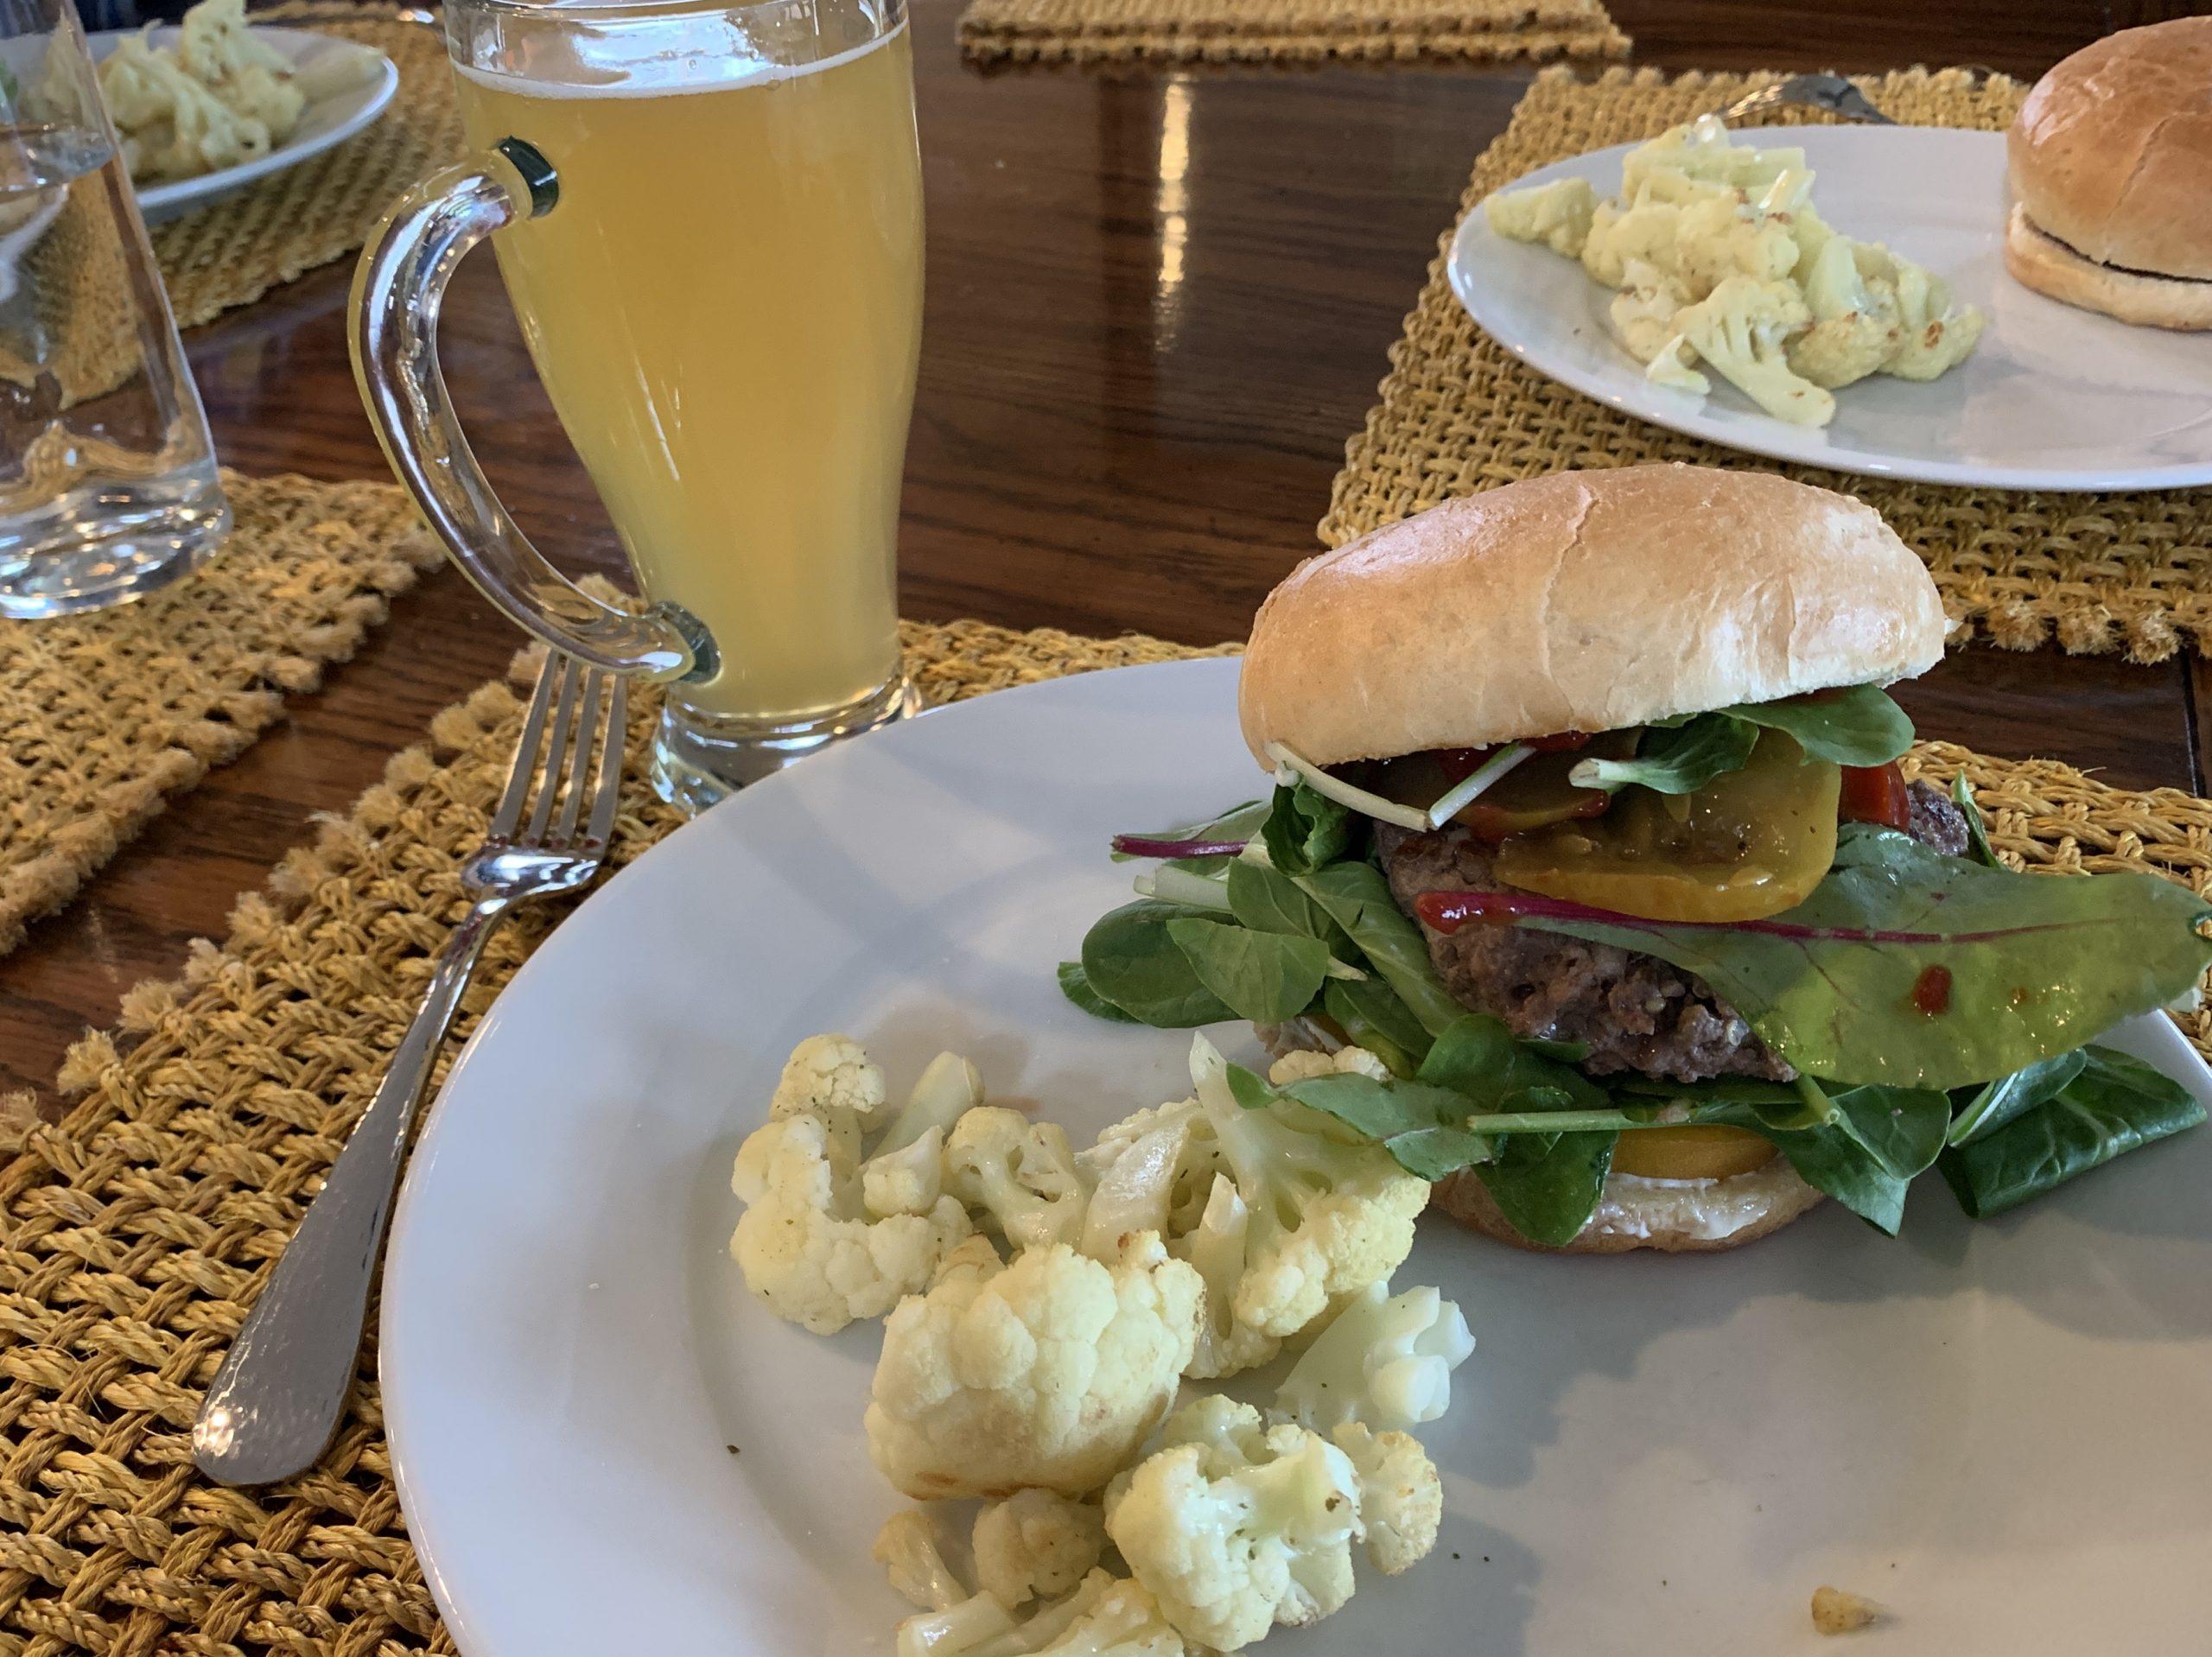 Day 14. Quinoa Beef Burgers & Roasted Cauliflower